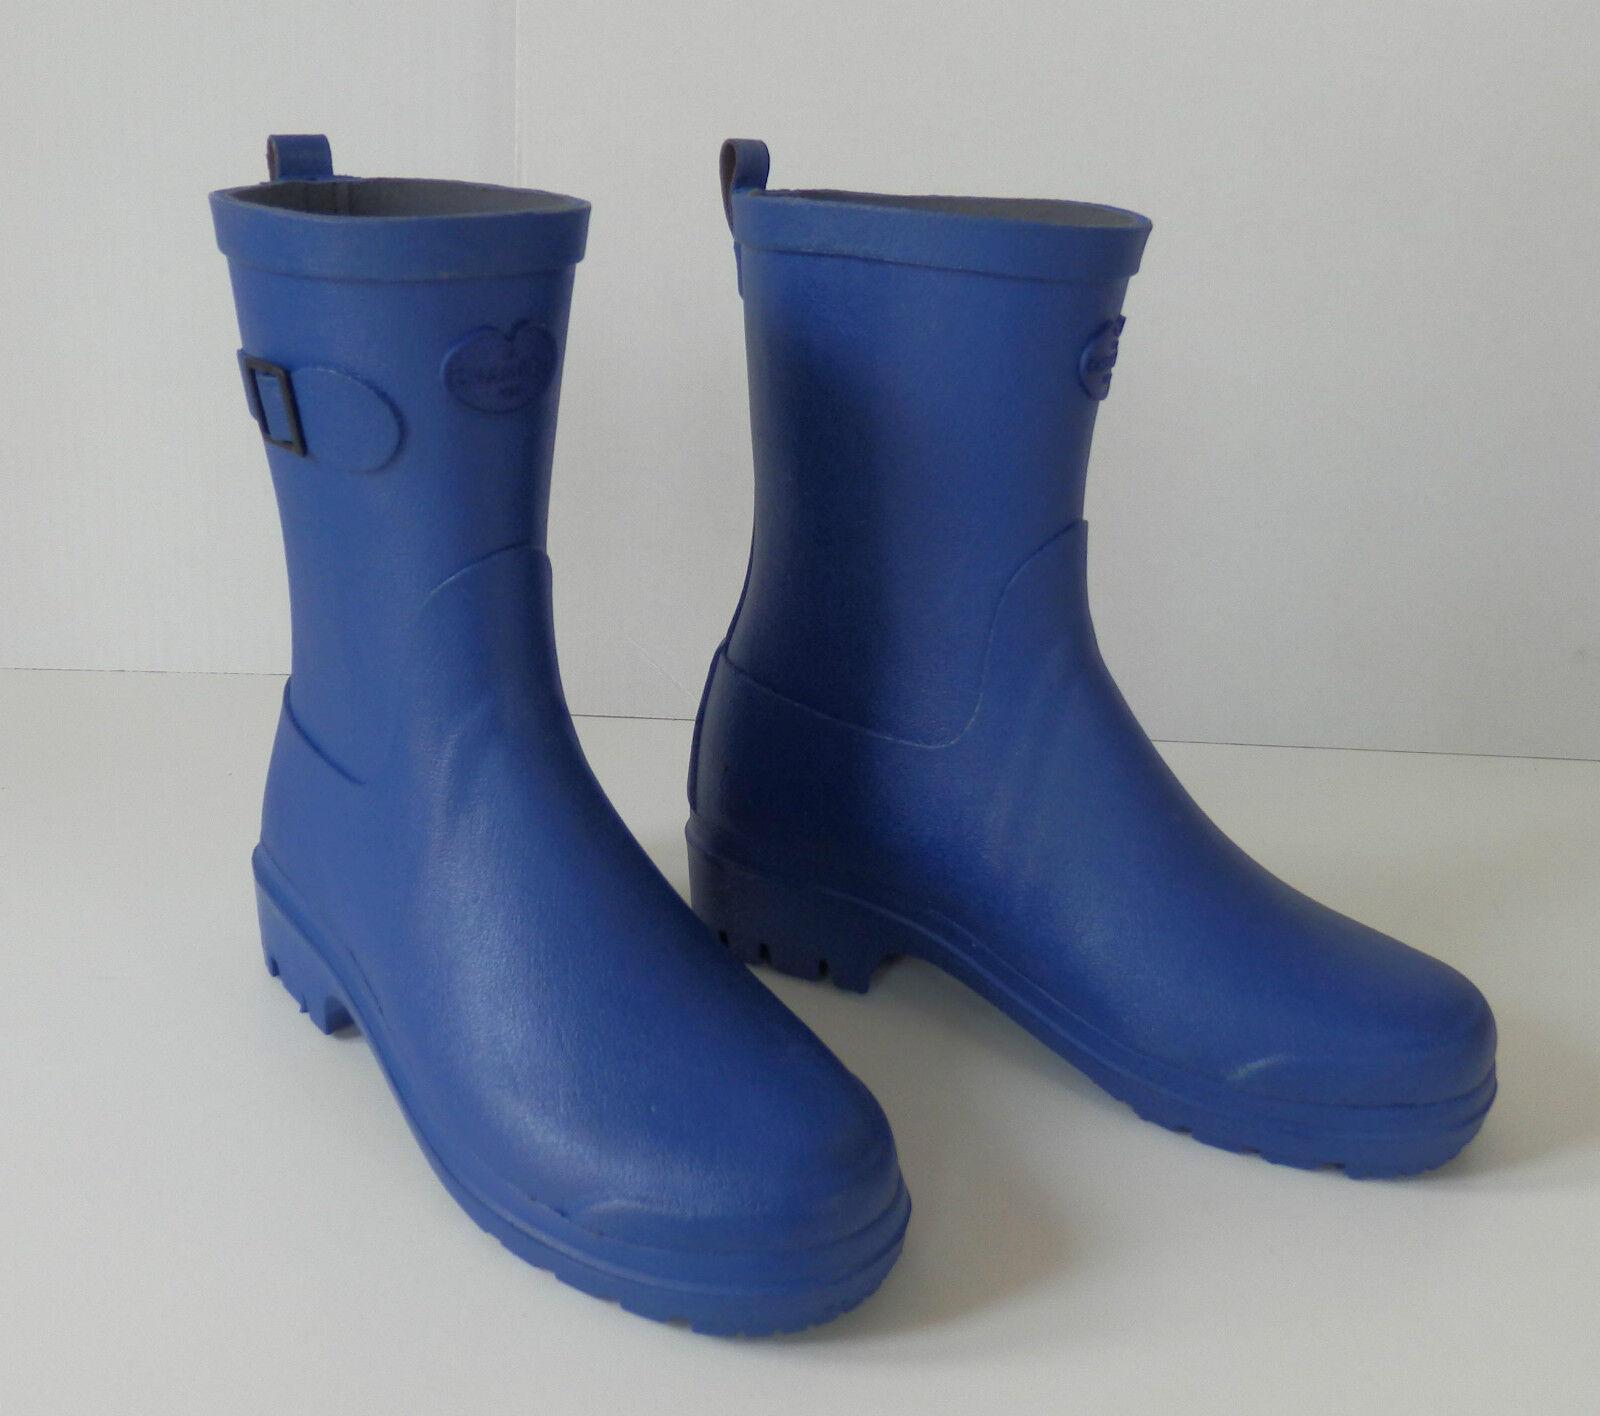 LE CHAMEAU LOW BOOT II Damen Gummistiefel Stiefelette blau 36, 38 neu